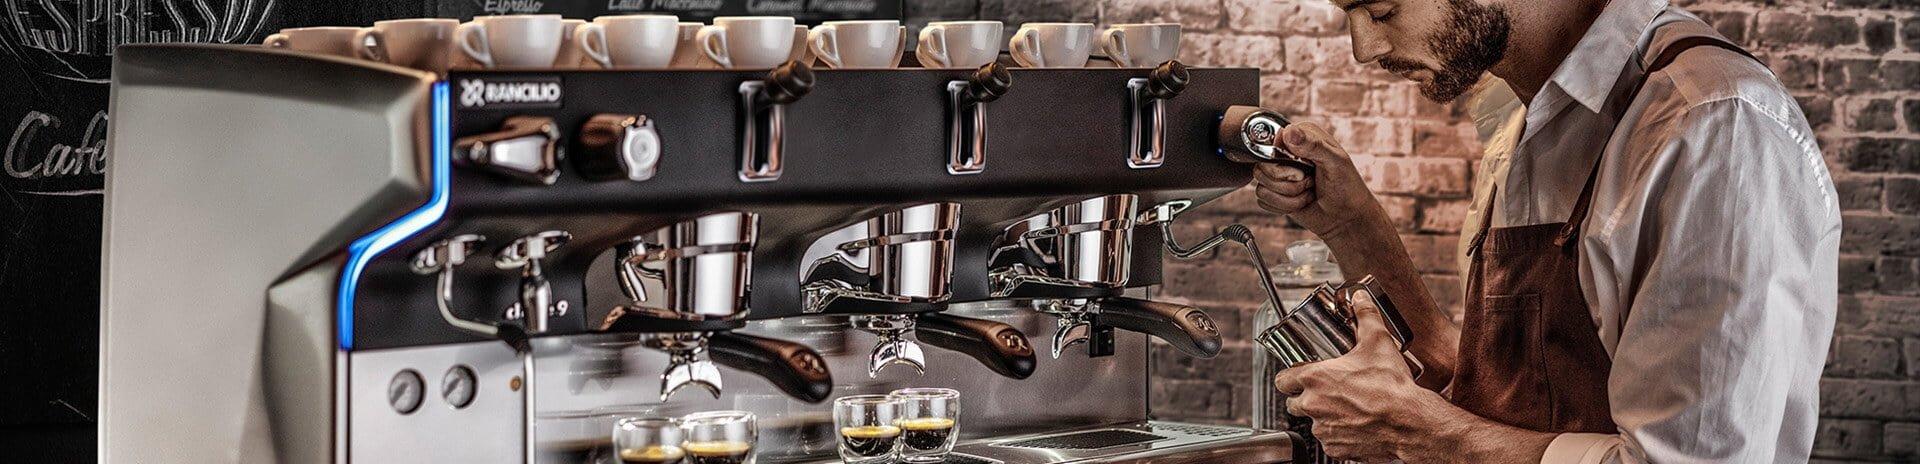 khoi nghiep cafe ban may pha cafe 2 group rancilio viet nam